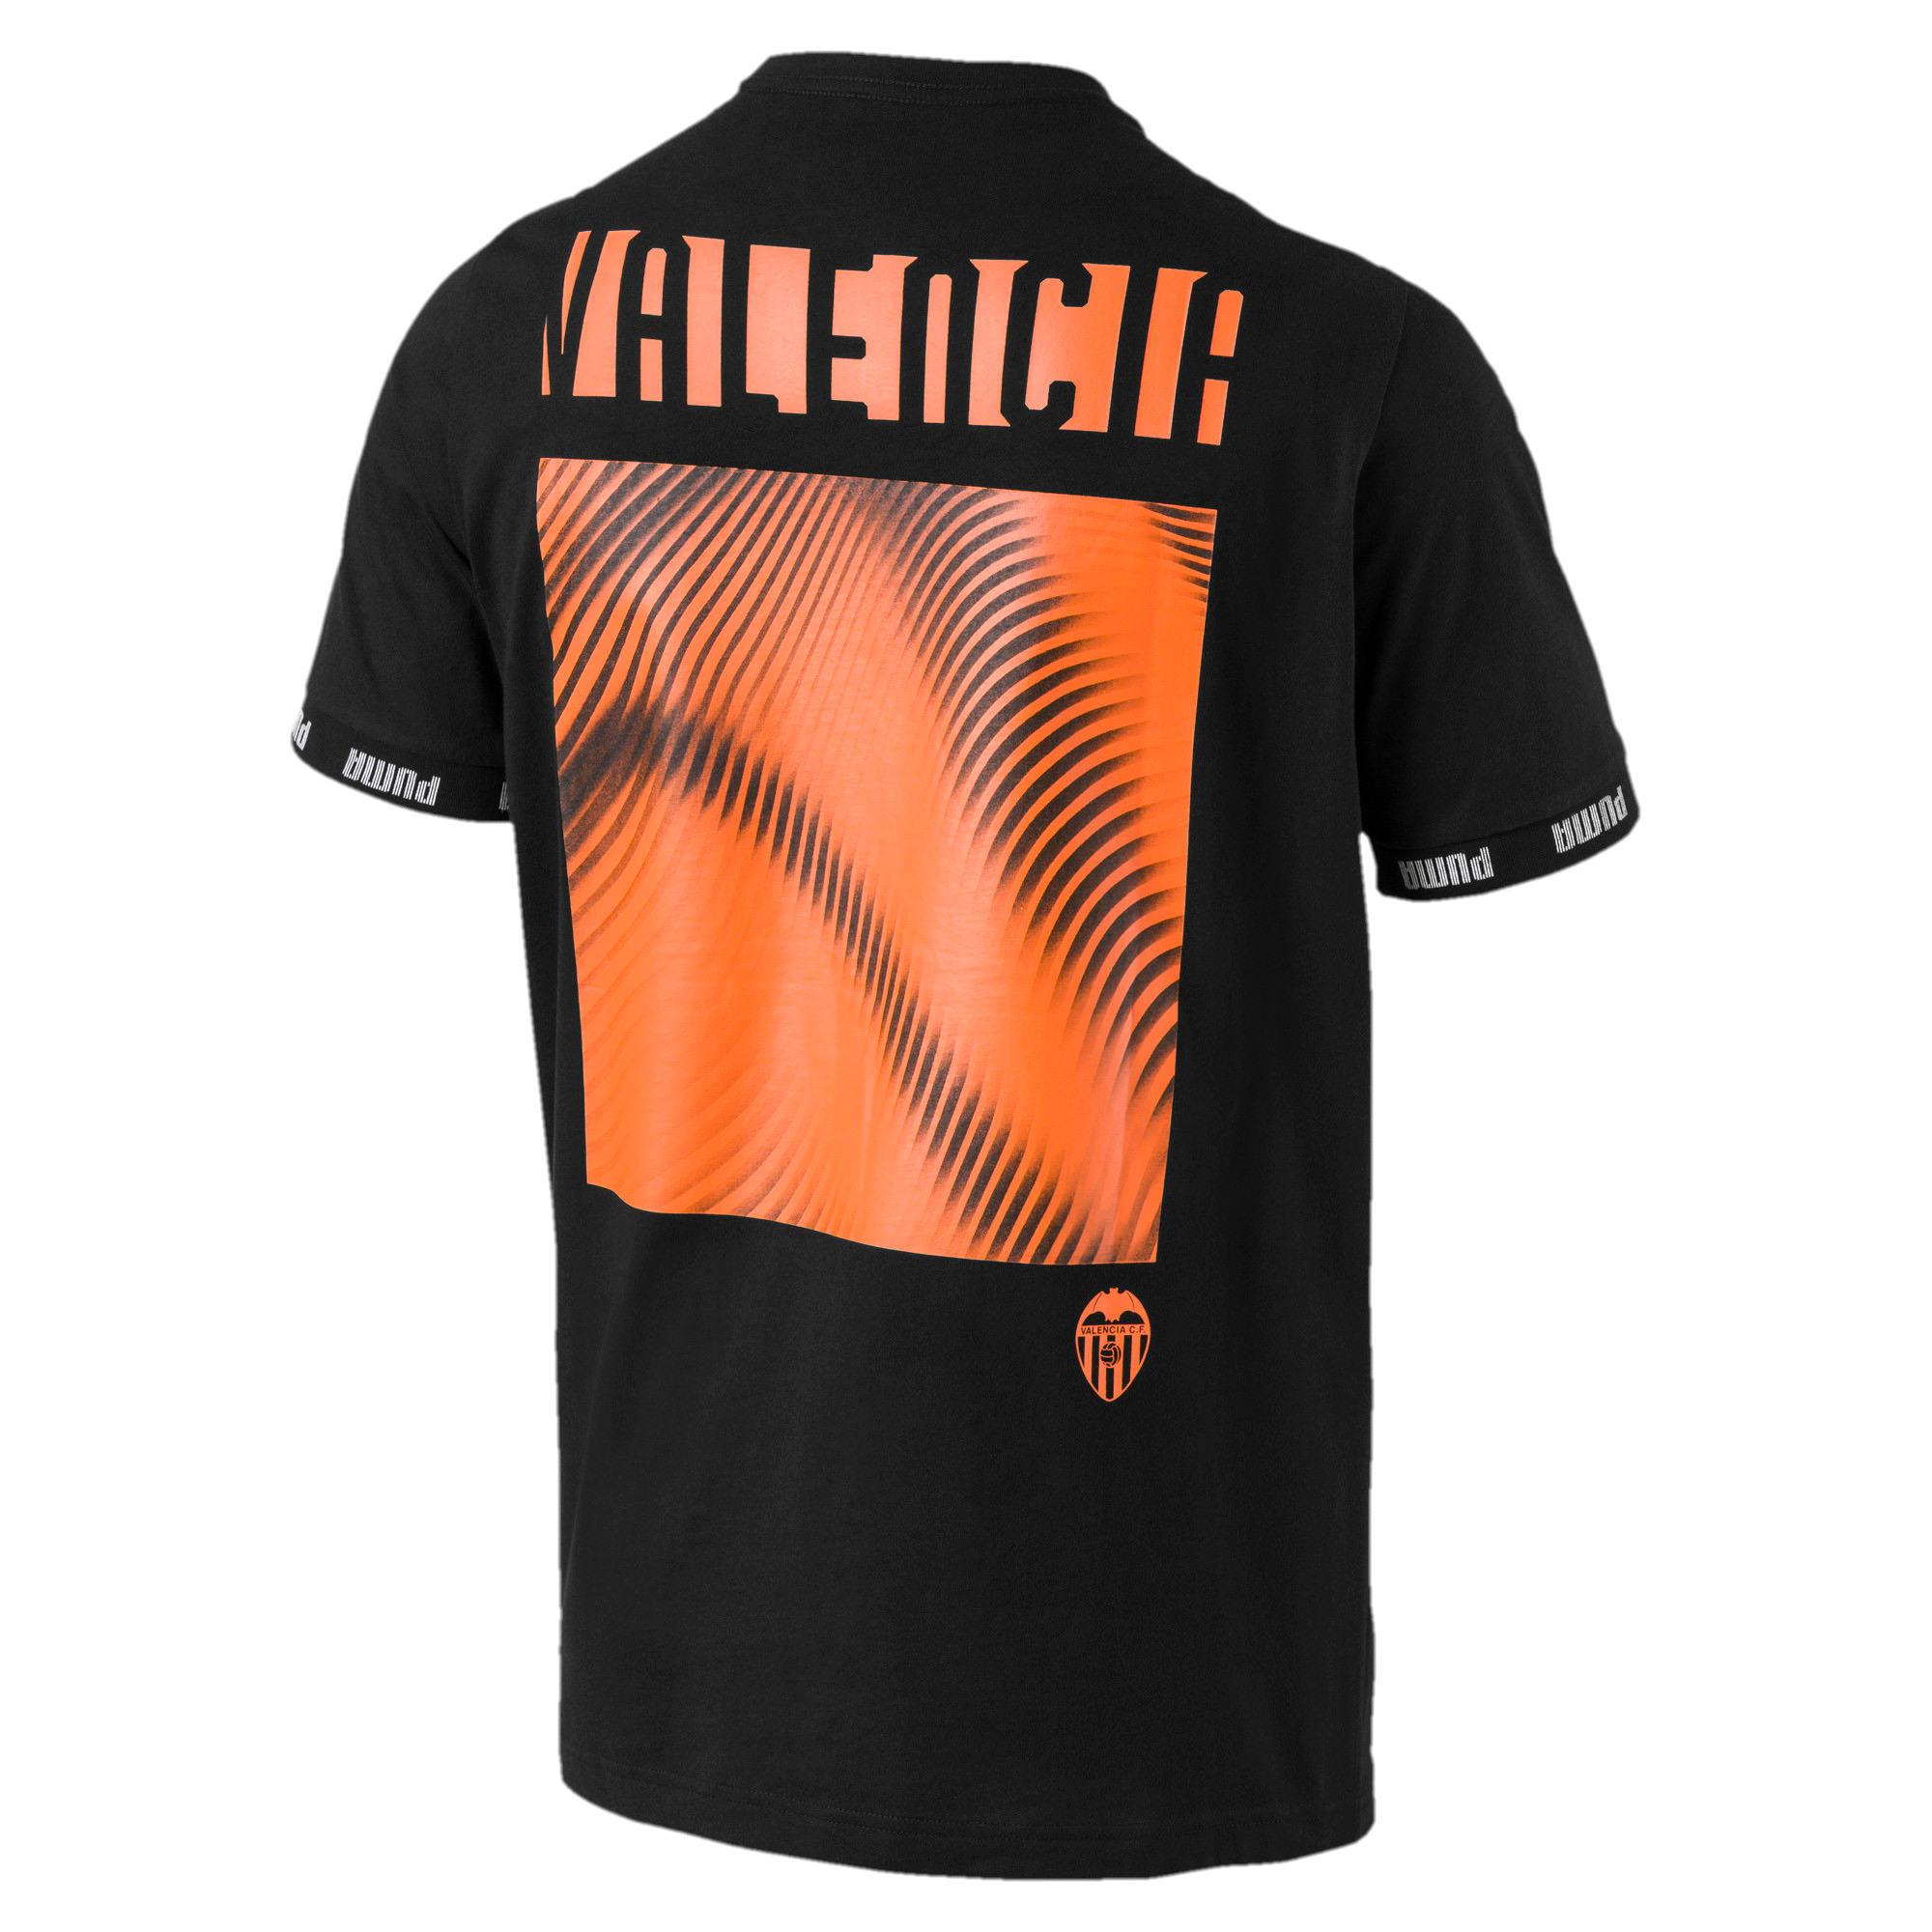 Thumbnail 2 of Valencia CF Football Culture Men's Tee, Puma Black, medium